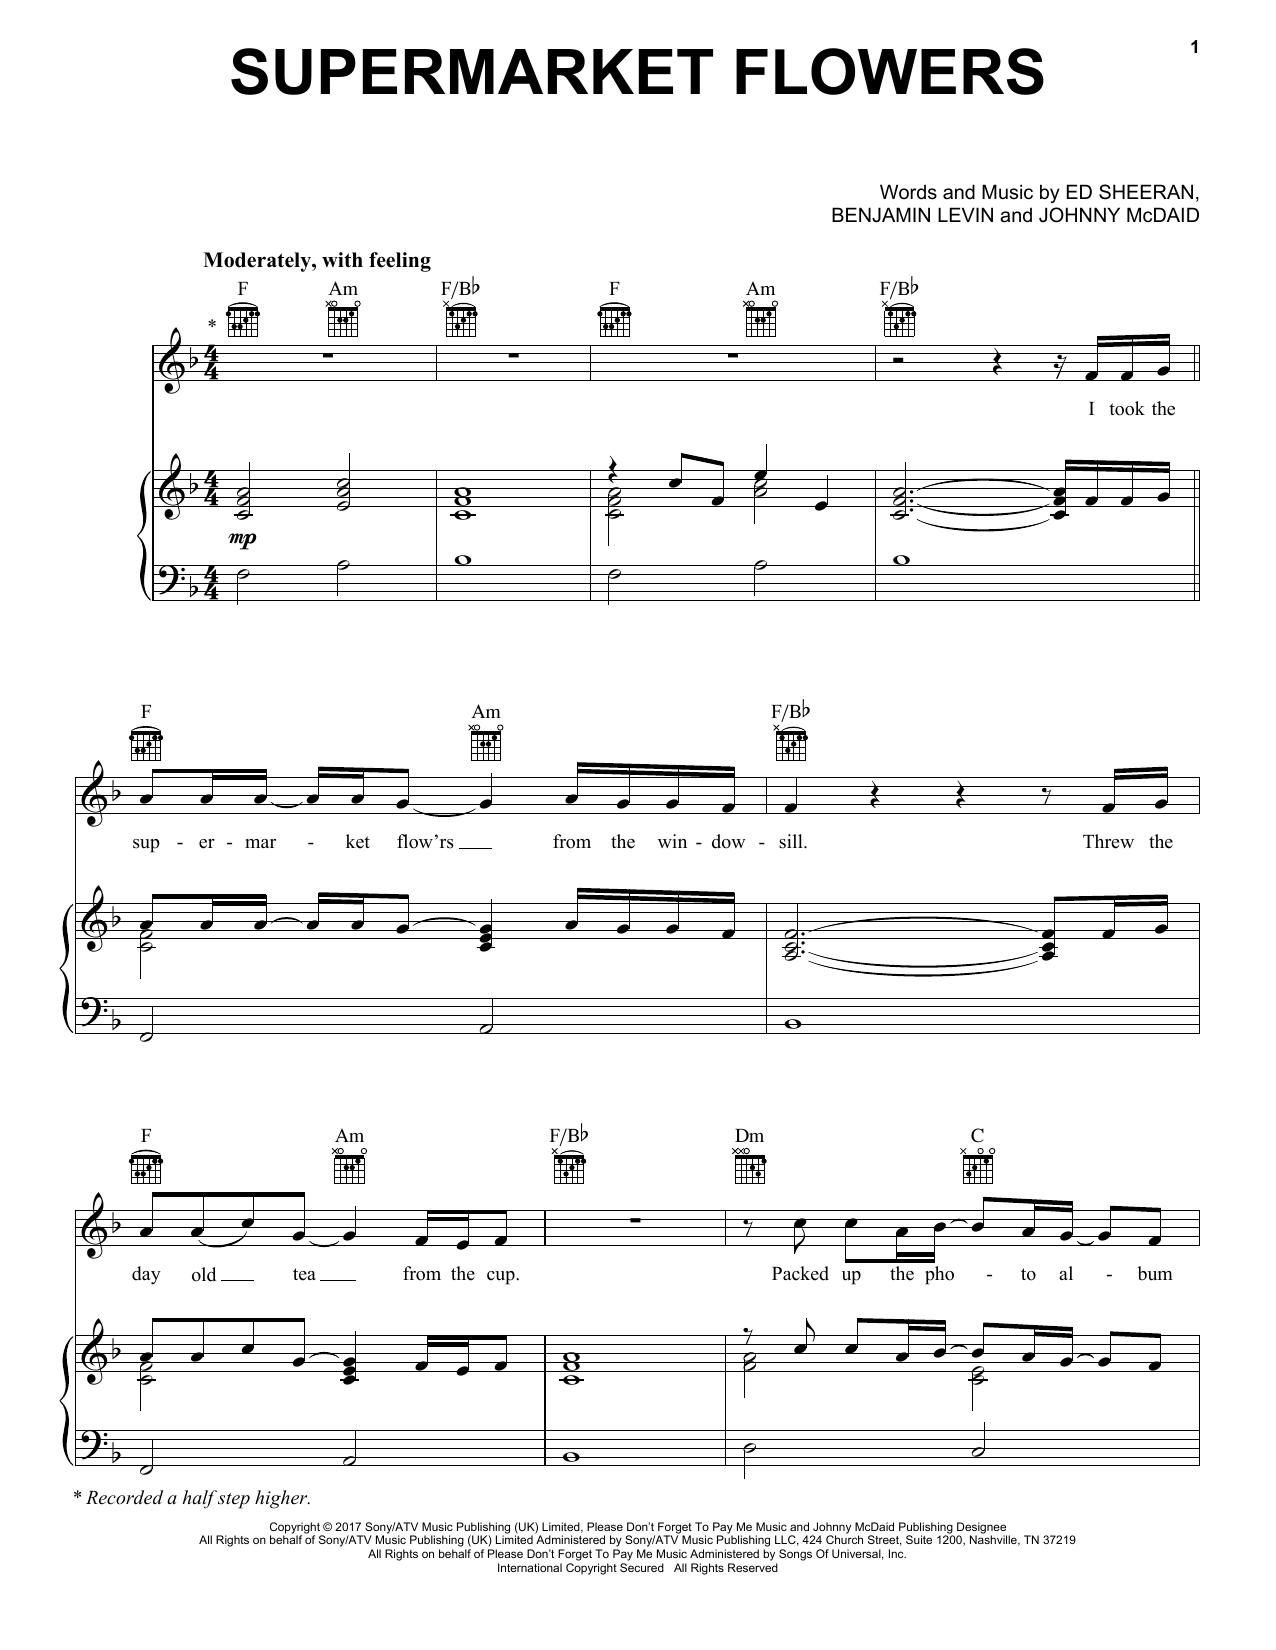 Ed Sheeran 'Supermarket Flowers' Sheet Music Notes, Chords   Download  Printable Piano, Vocal & Guitar (Right-Hand Melody) - SKU: 181412